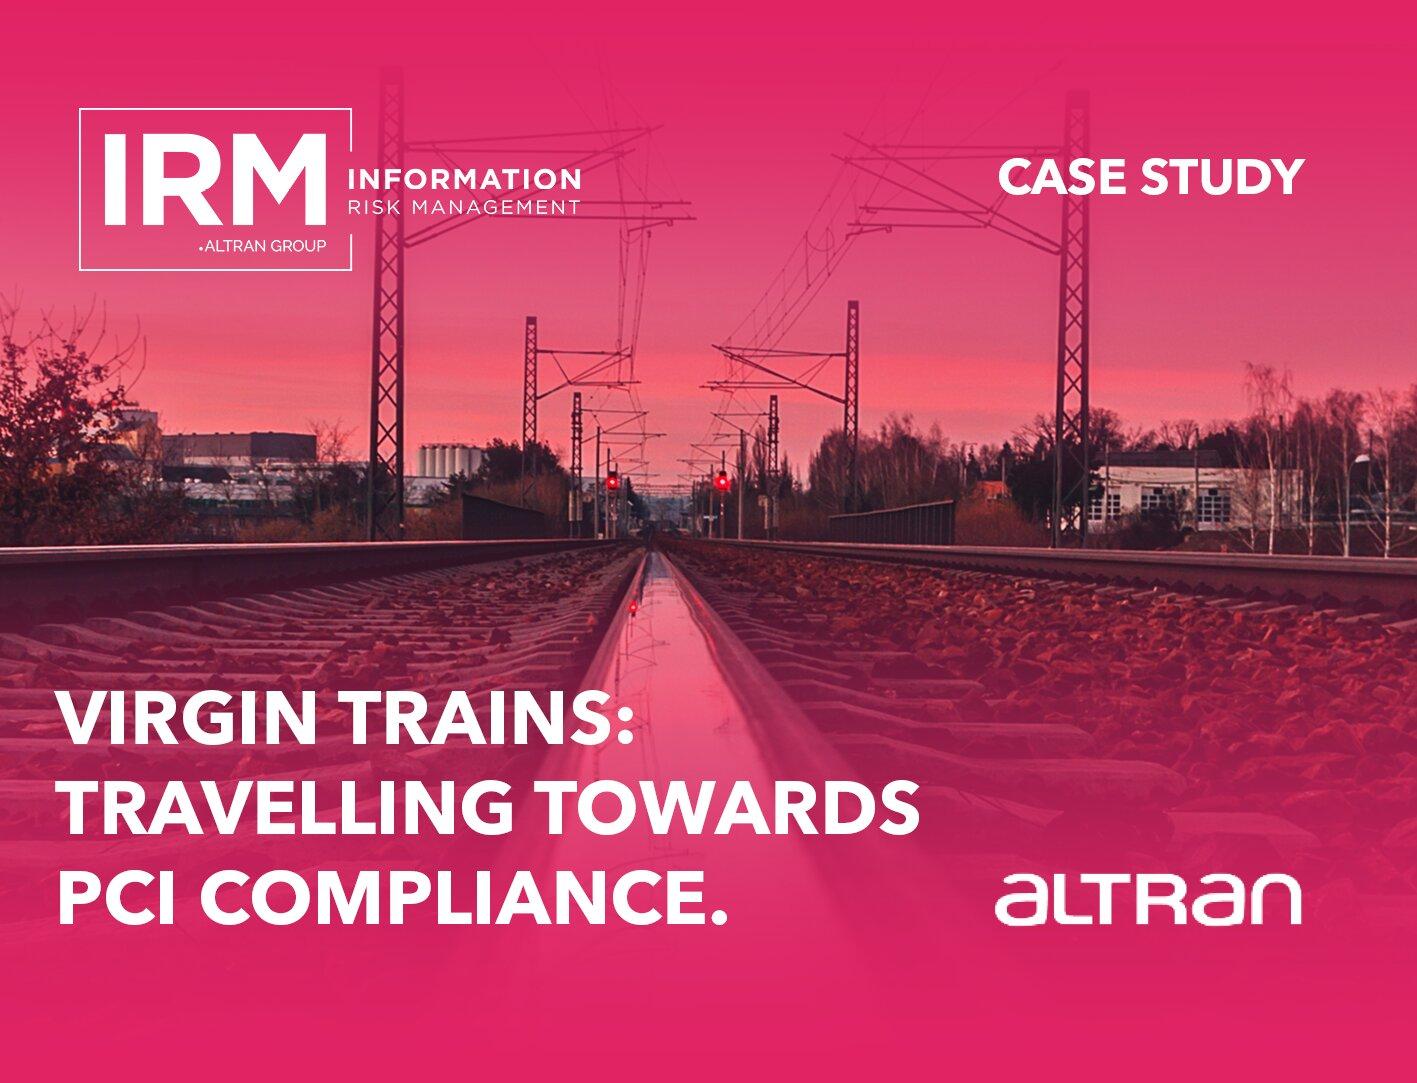 Virgin_Trains_Case_Study_Mini_ID